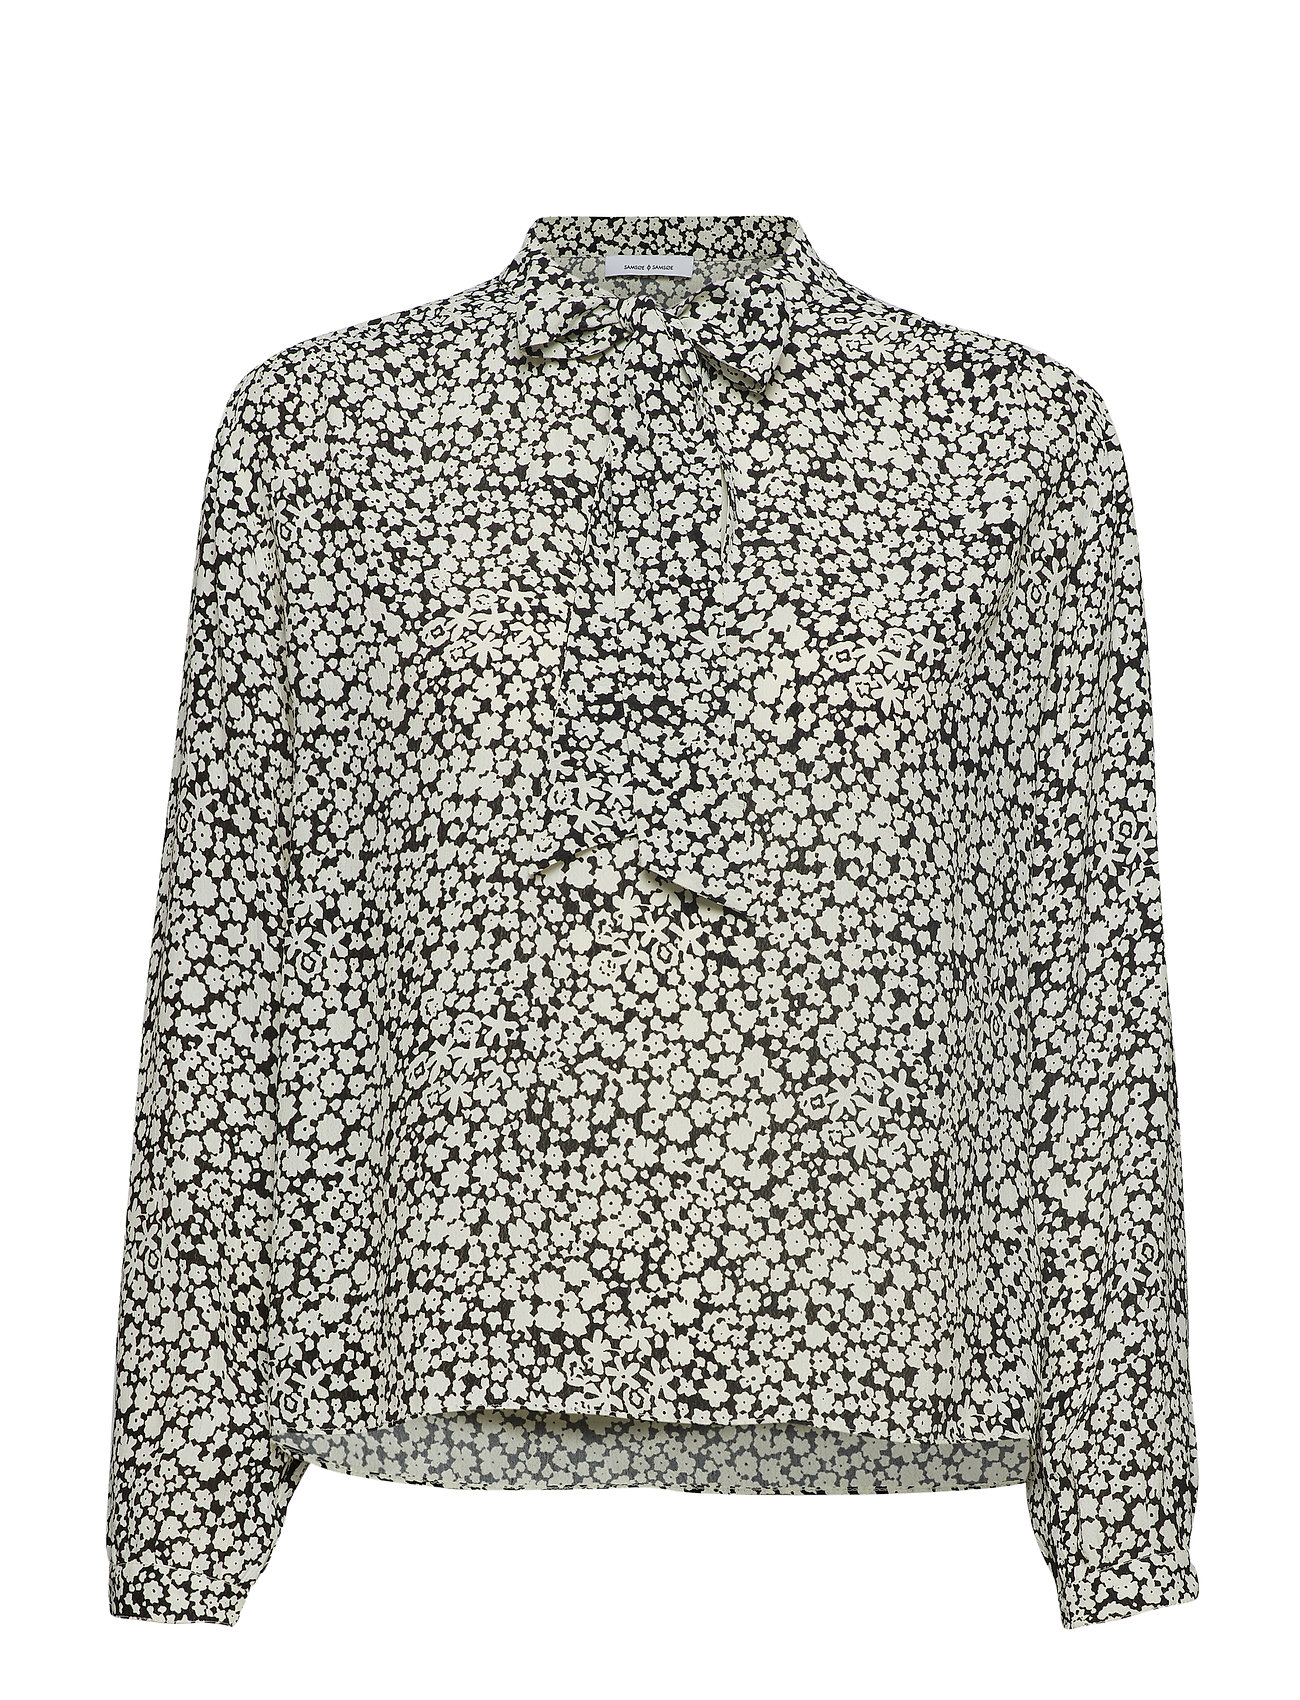 Samsøe & Samsøe Merrit blouse aop 10867 - ECRU BUTTERCUP